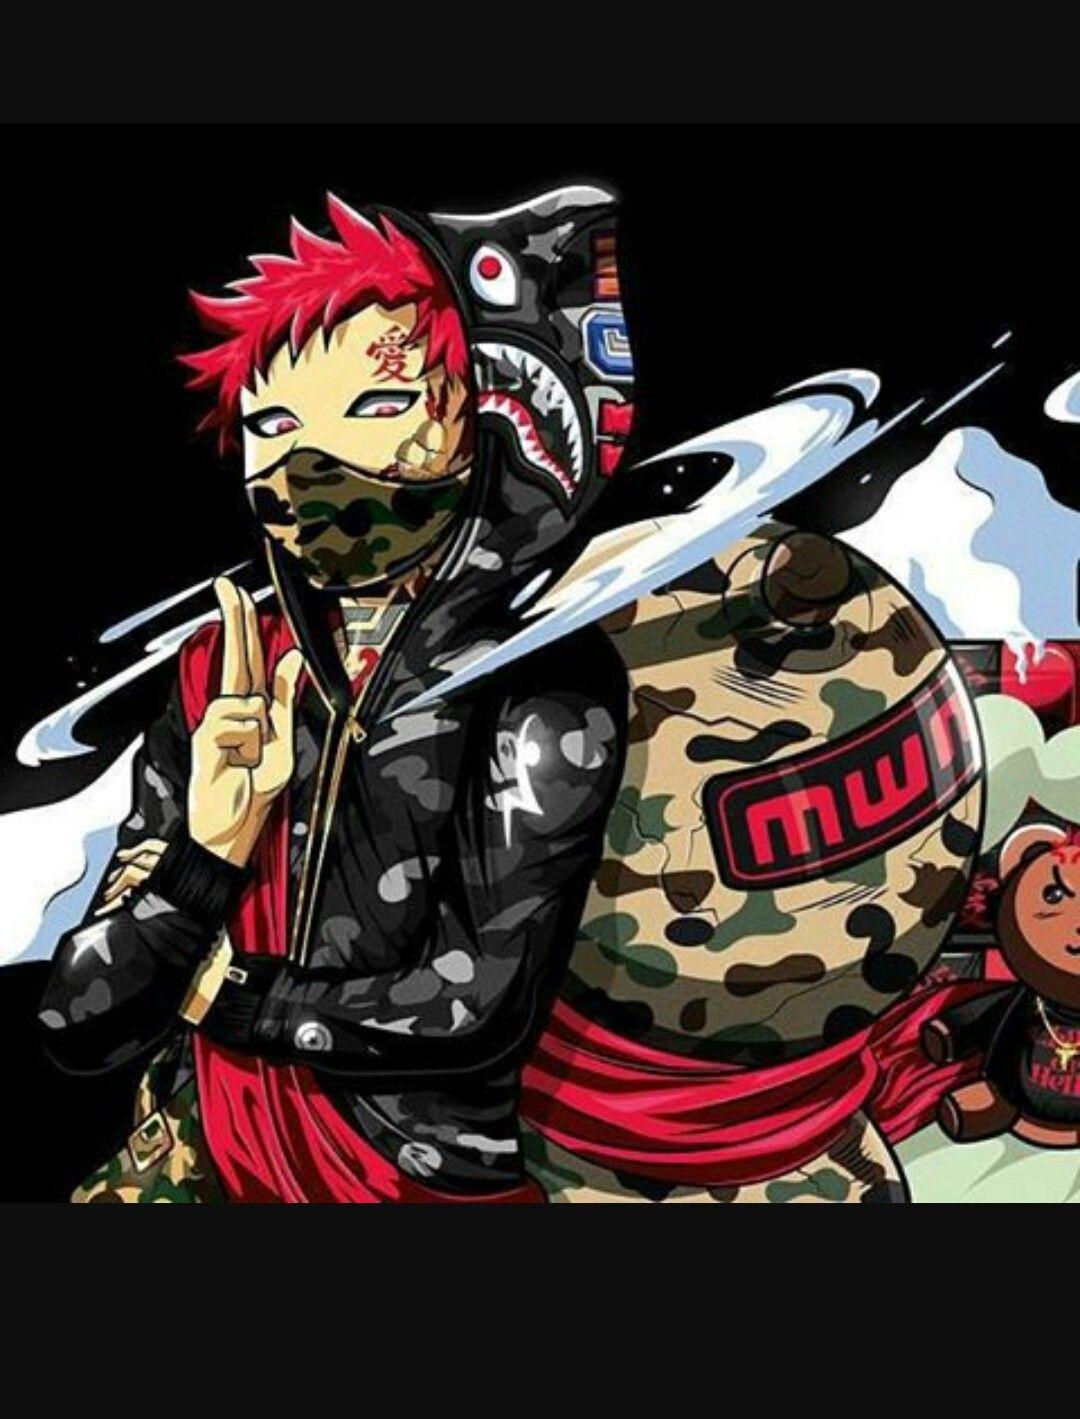 Pin by Anthony guimond on Badass art Black anime